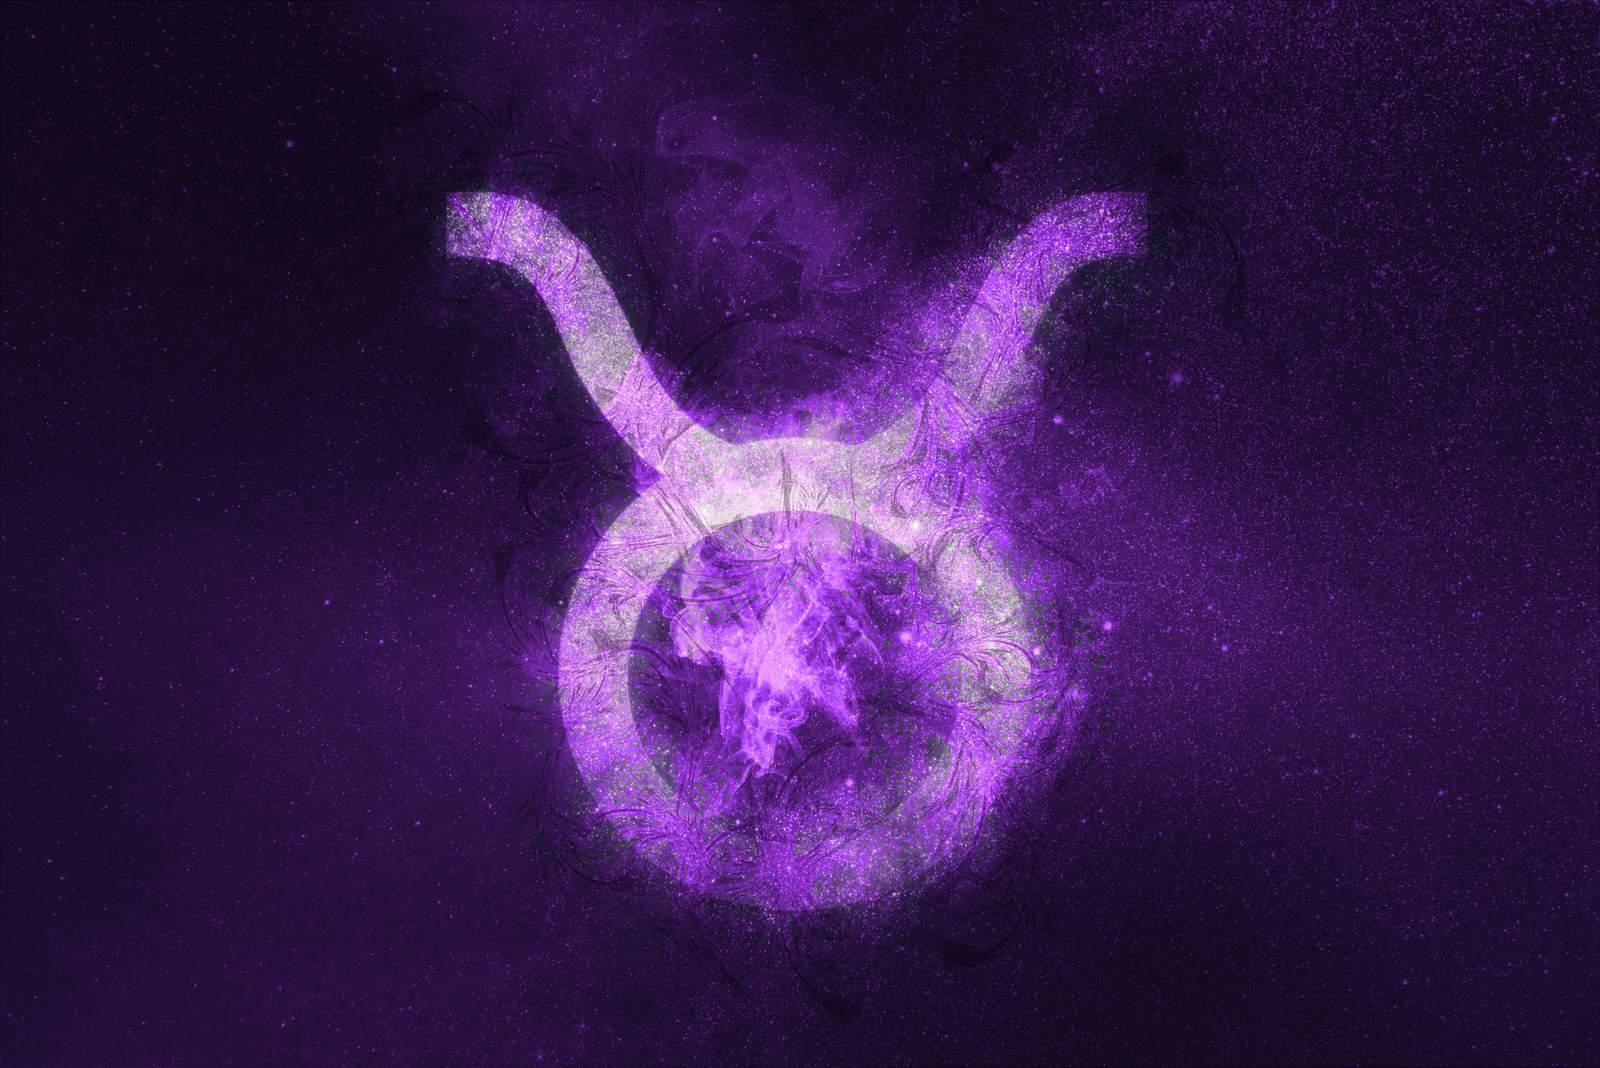 Zodiac sign of Taurus